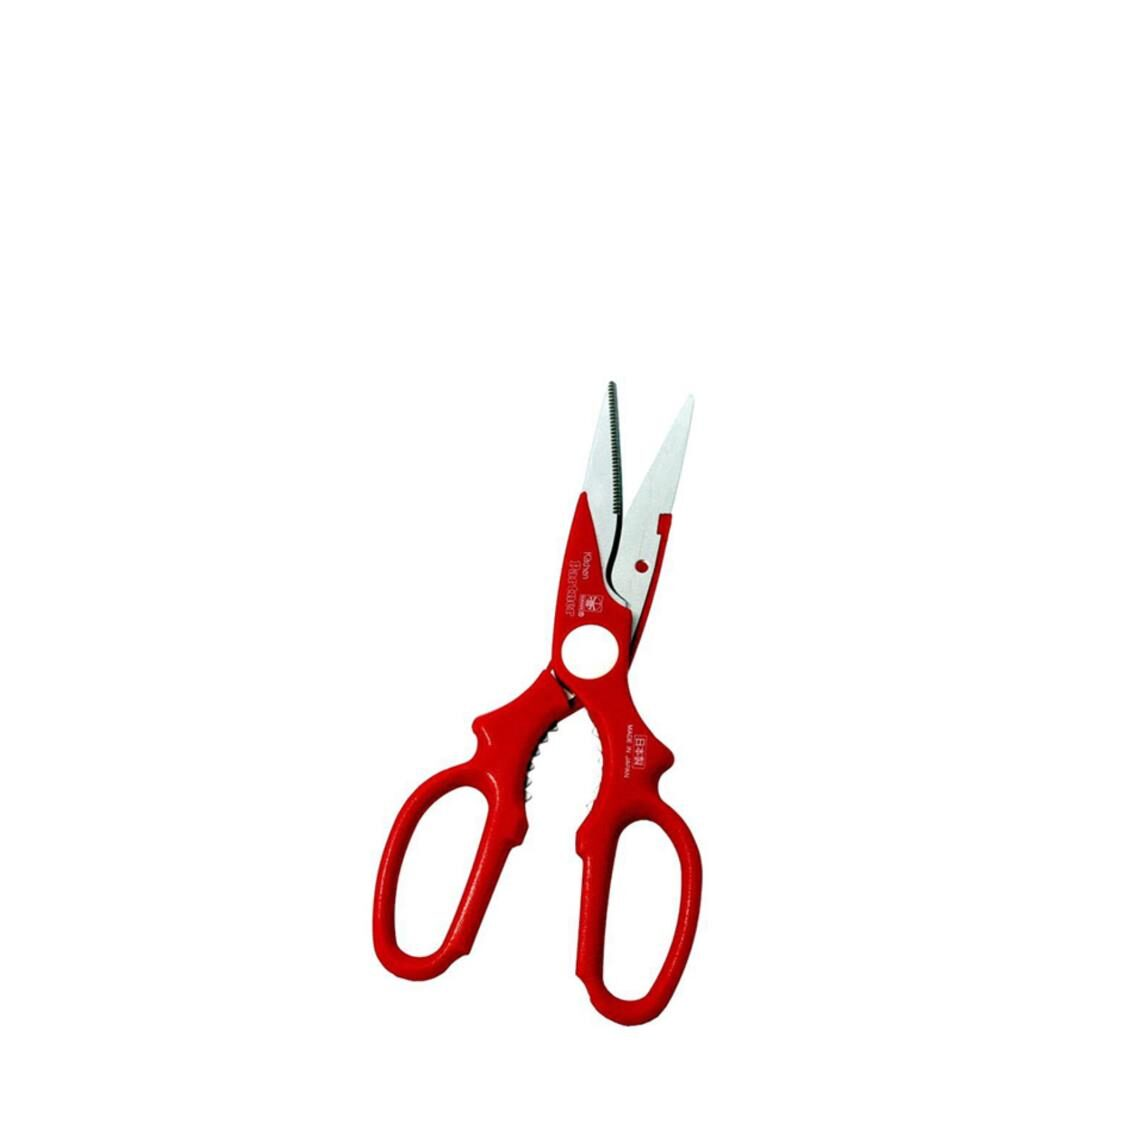 Nikken Kitchen Scissors Partner Long Made In Japan